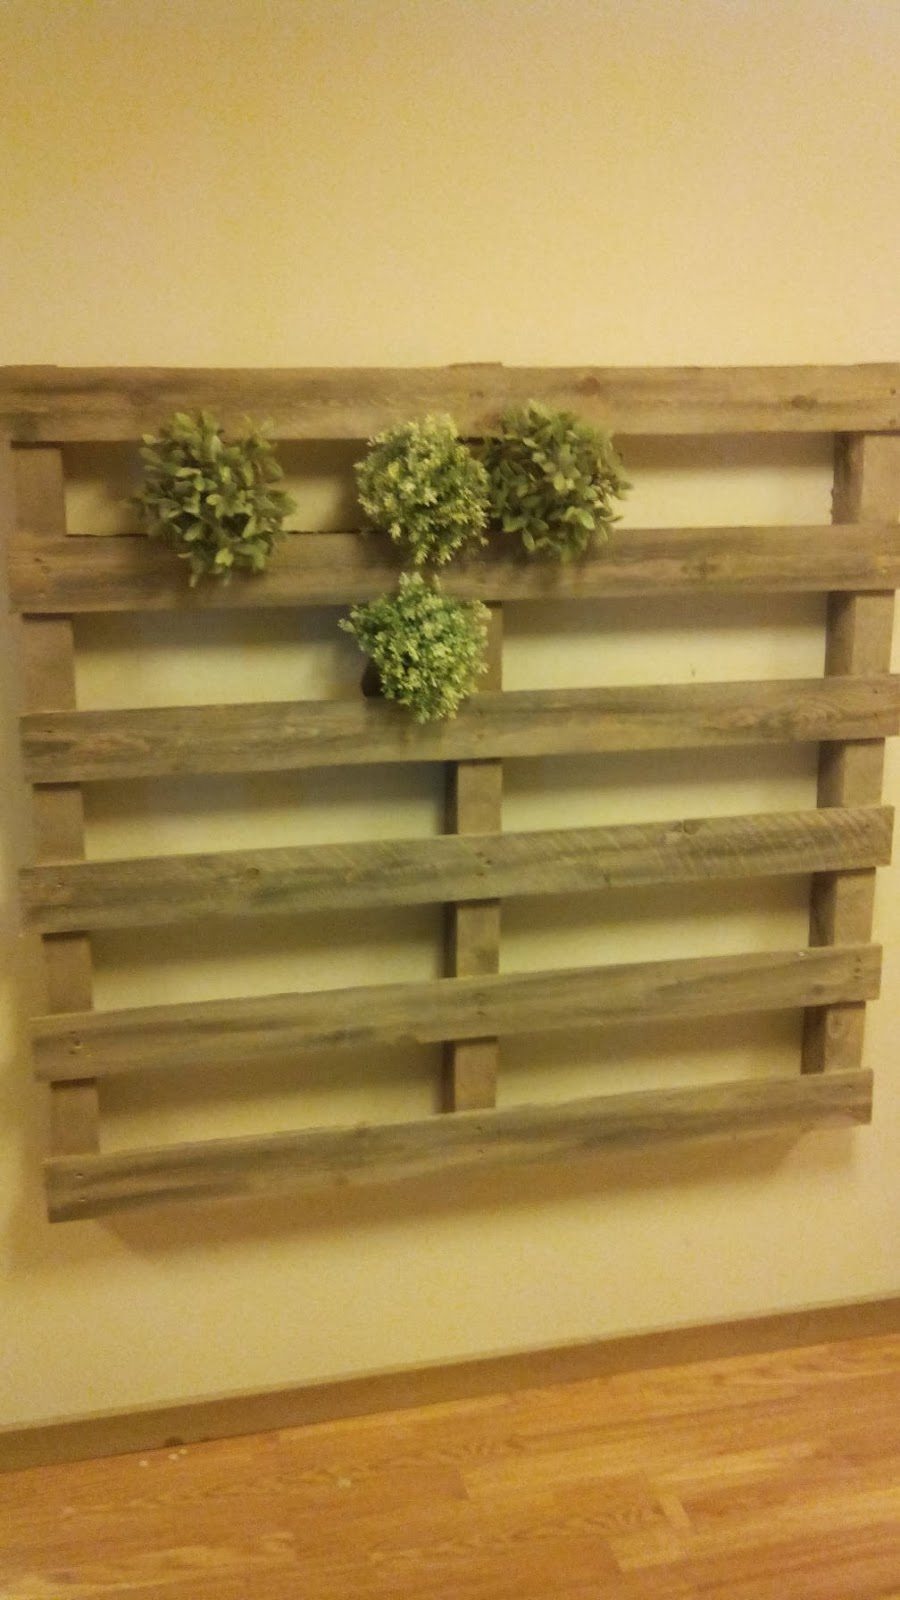 Jard n vertical hecho con palets for Catalogo ikea muebles de jardin